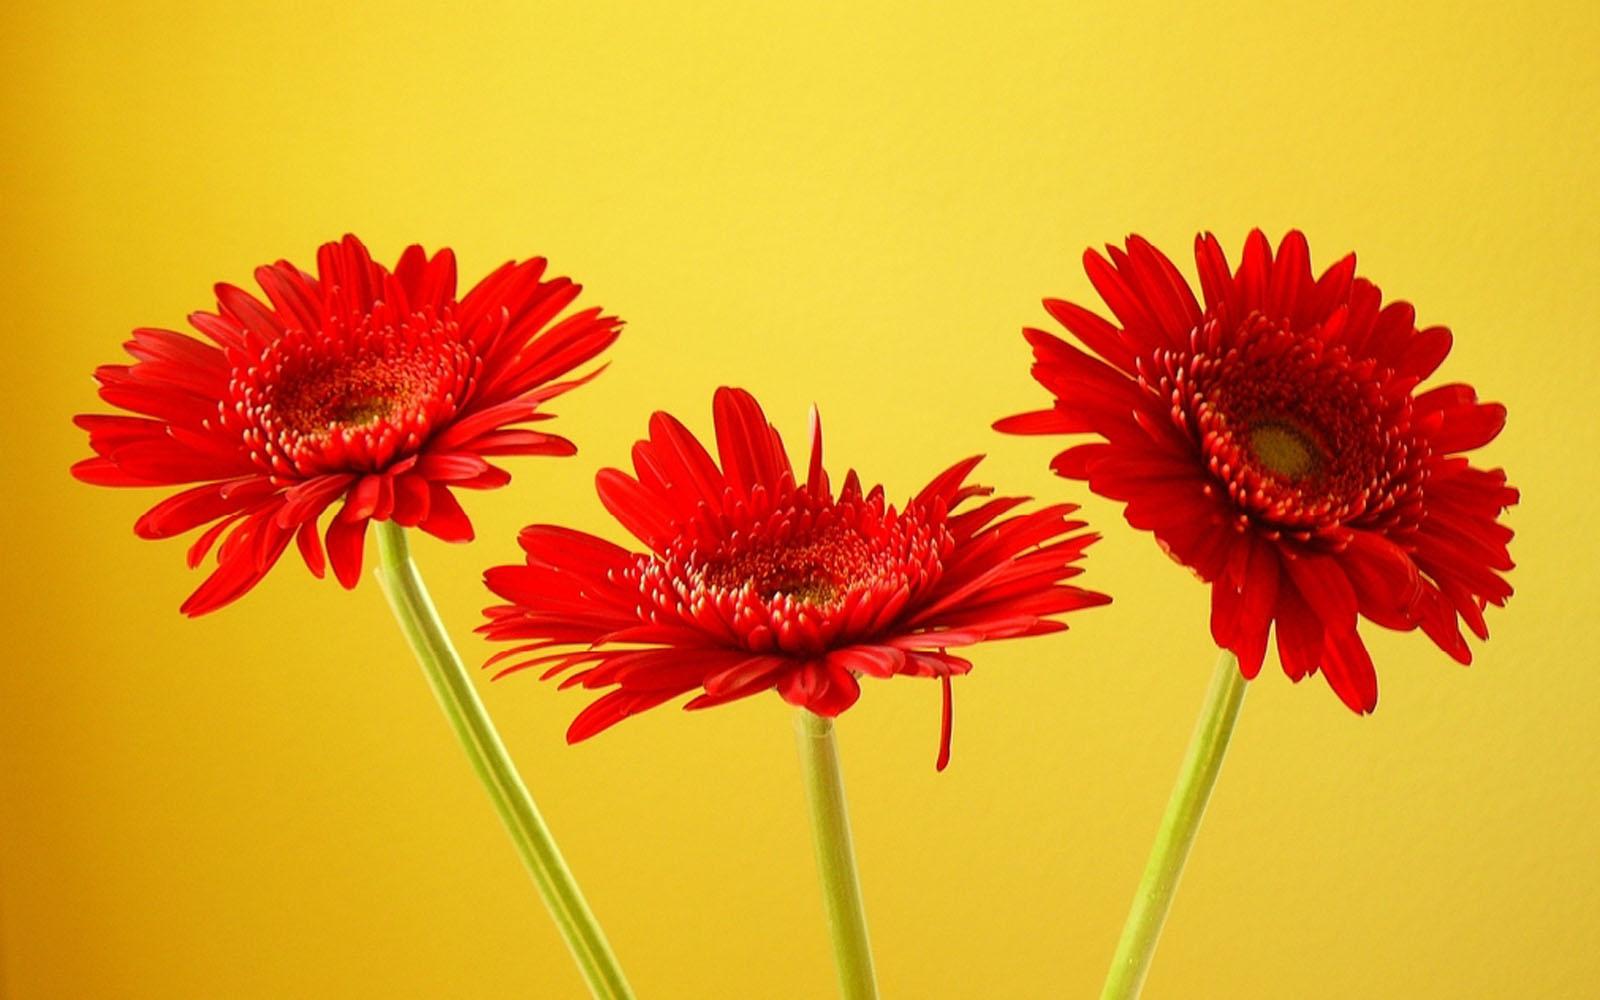 Hd Autumn Desktop Wallpaper Wallpapers Gerbera Flowers Wallpapers